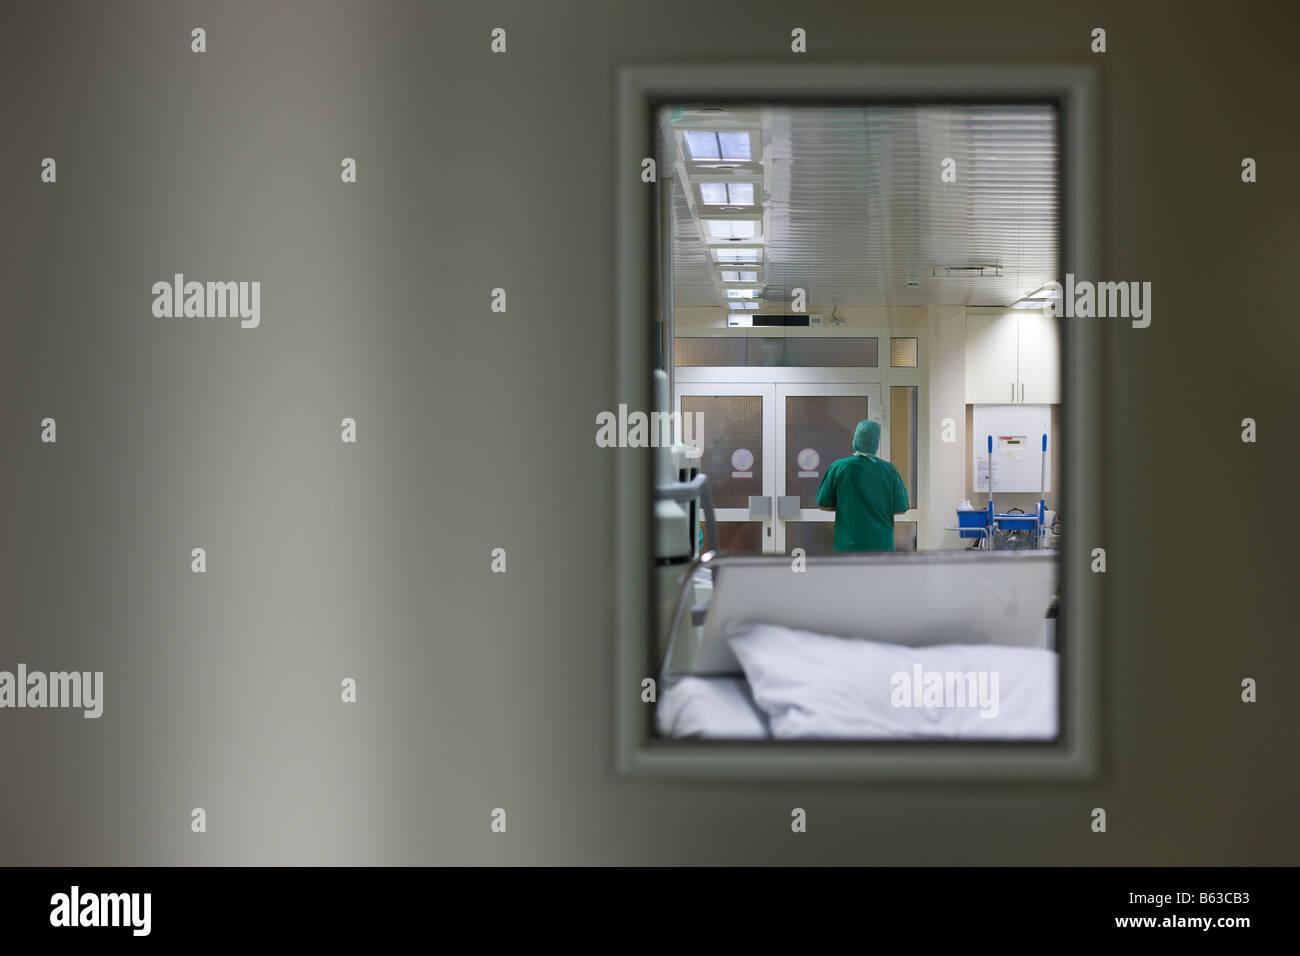 Neurosurgeon thru window entering operating room, Reykjavik Hospital, Iceland - Stock Image